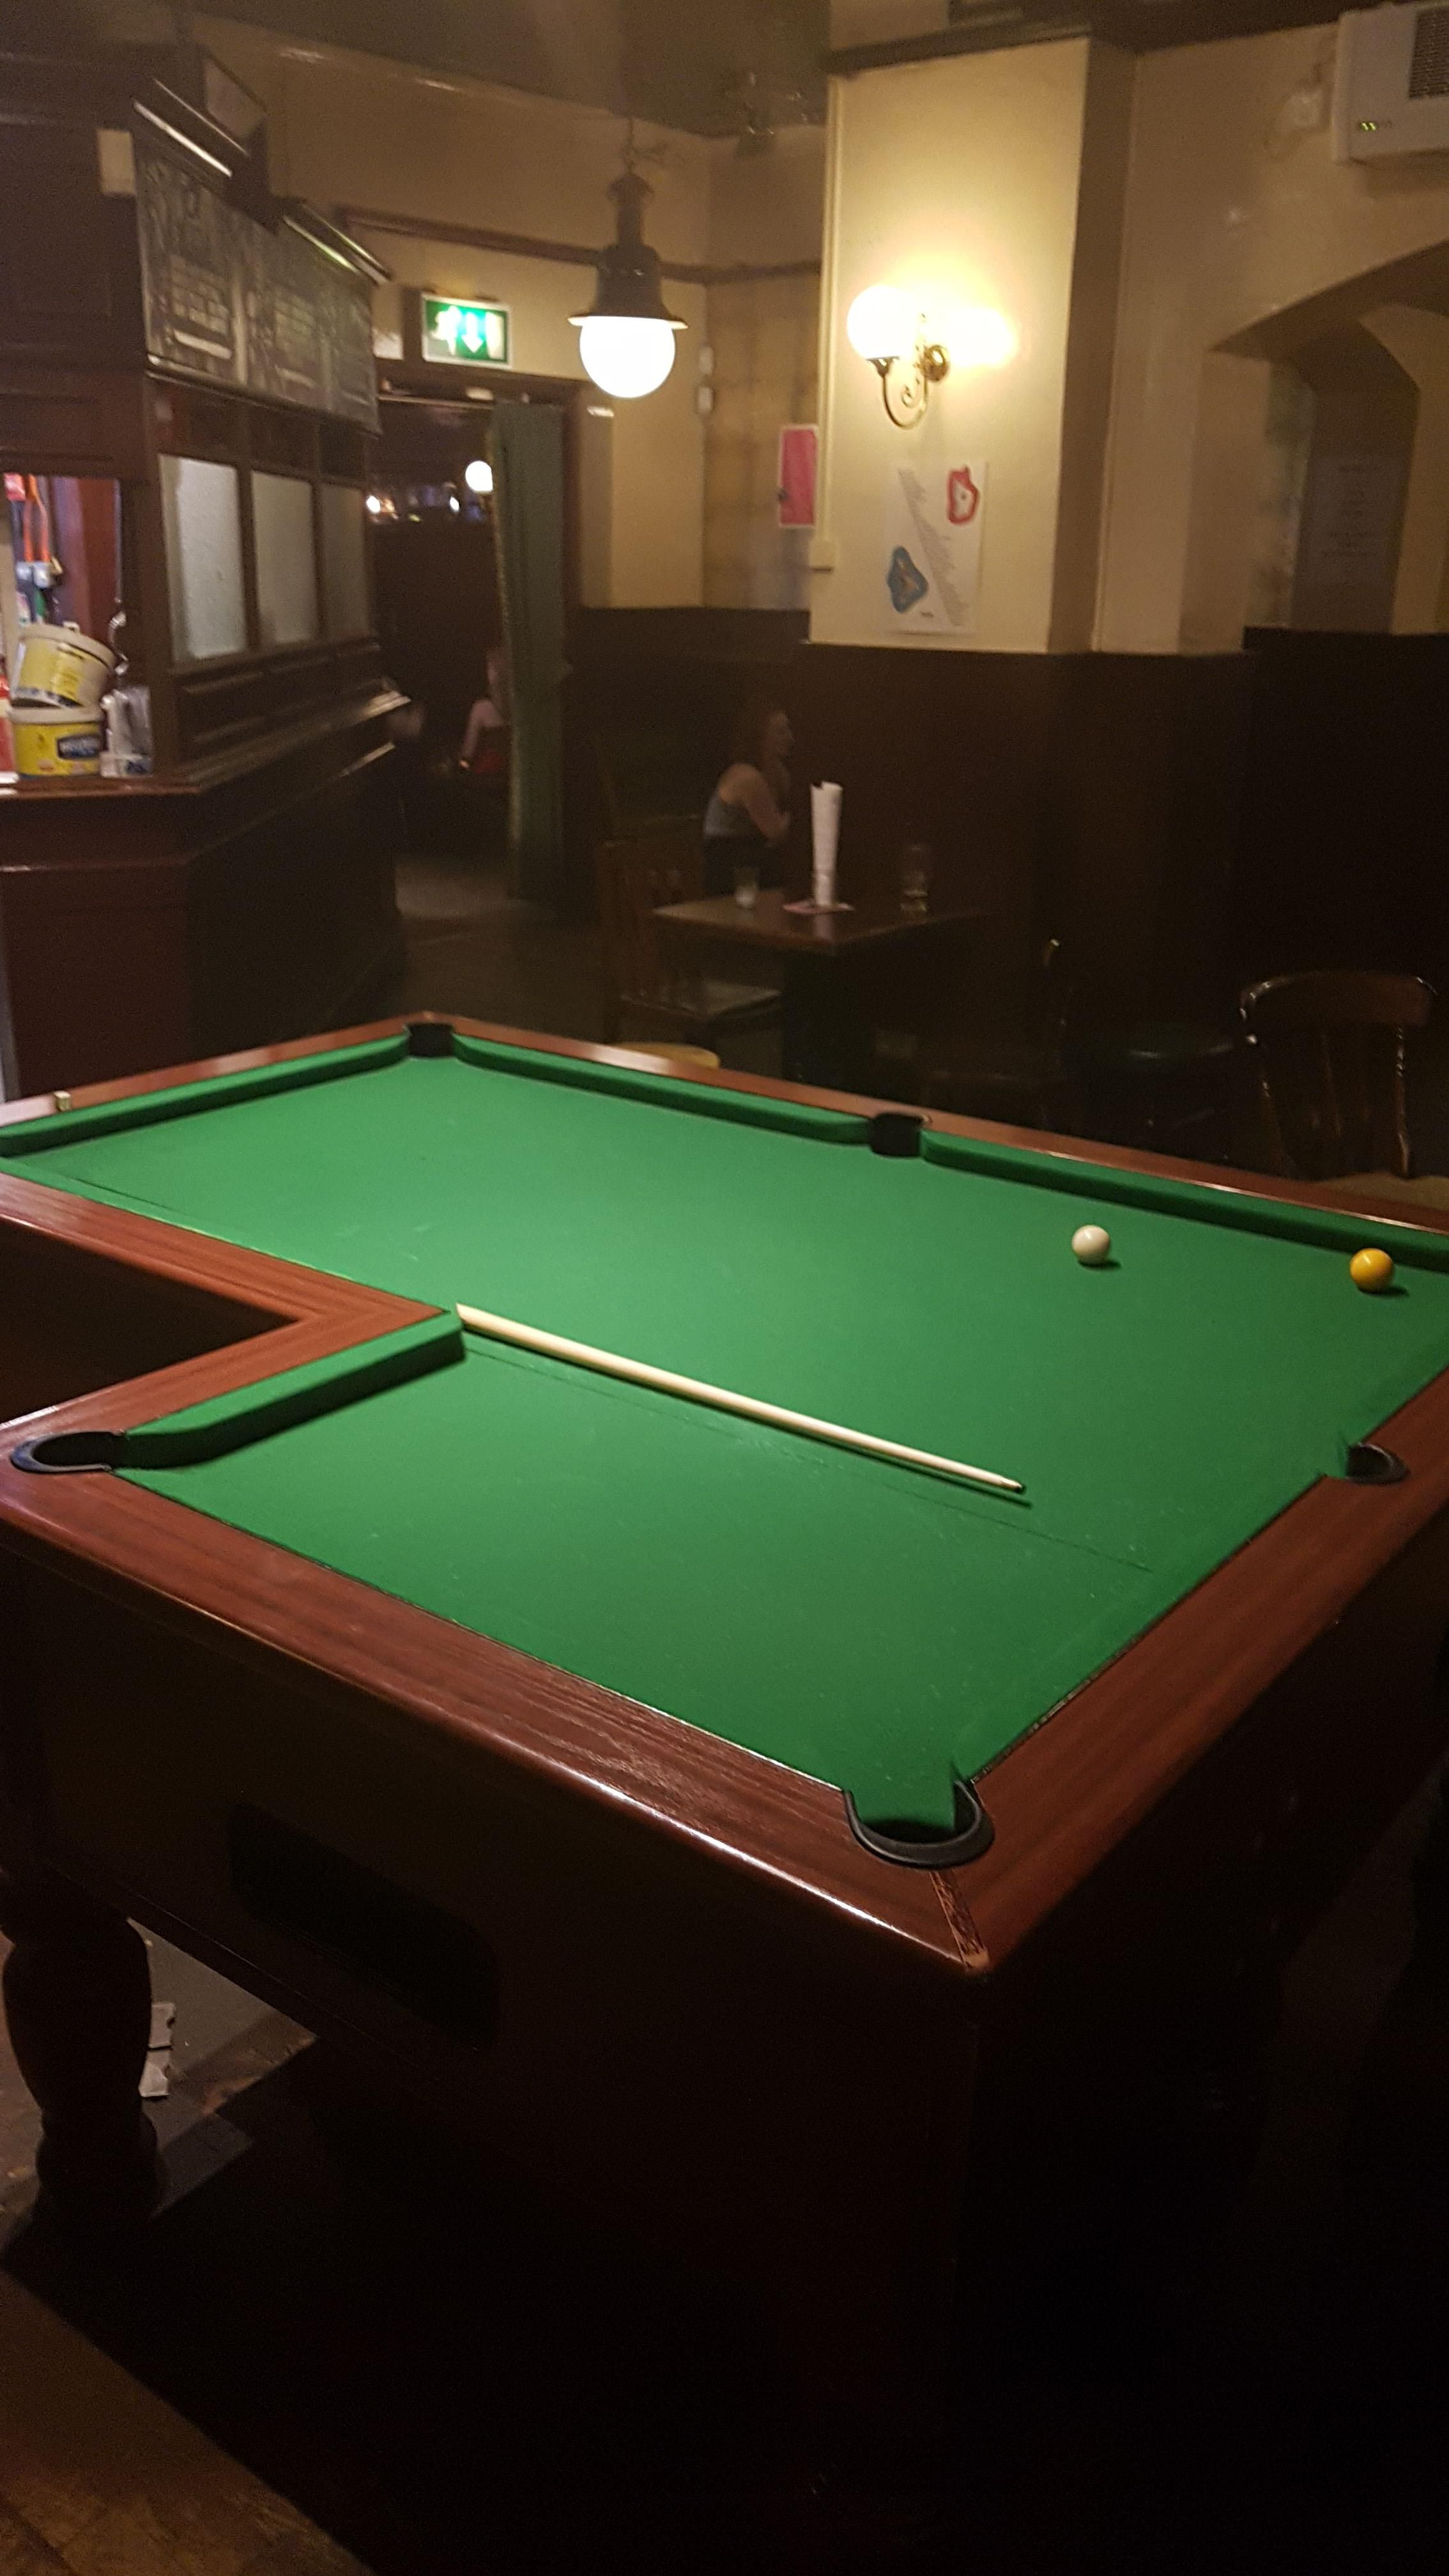 Tonight I Played On An L Shaped Pool Table Http Ift Tt 2pdgq25